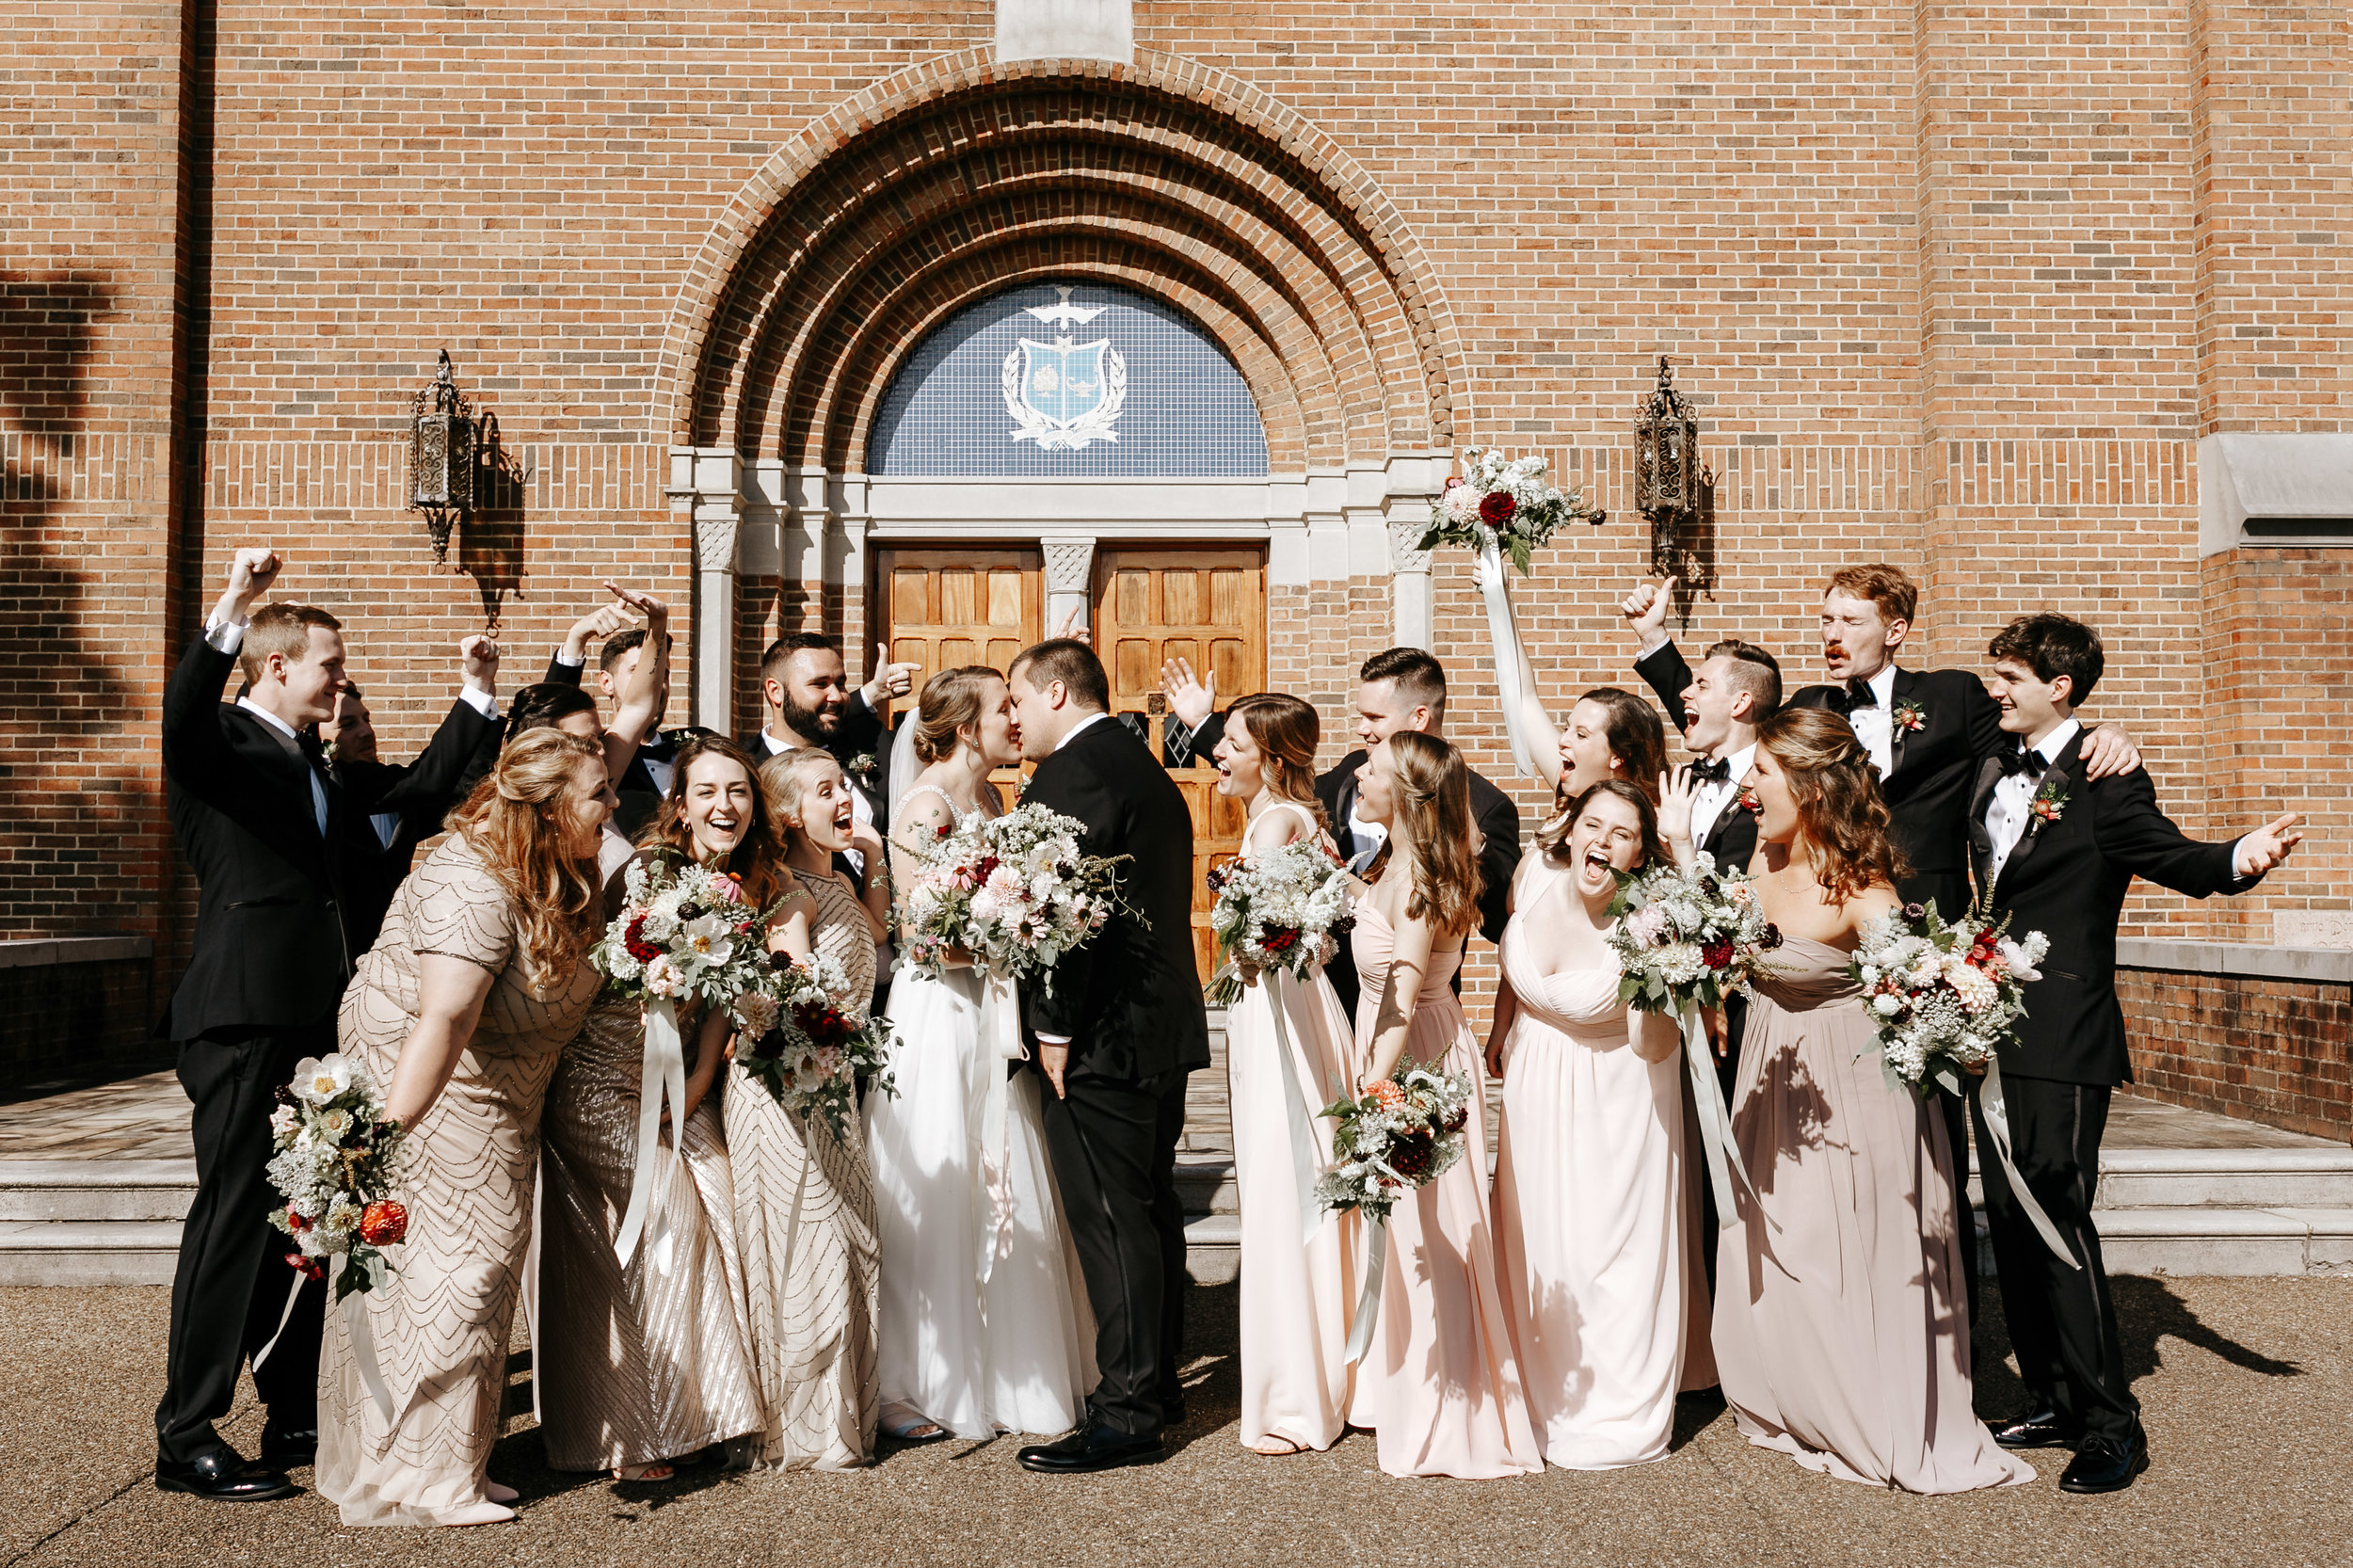 bohemian-photographer-wedding-tennessee-37.jpg